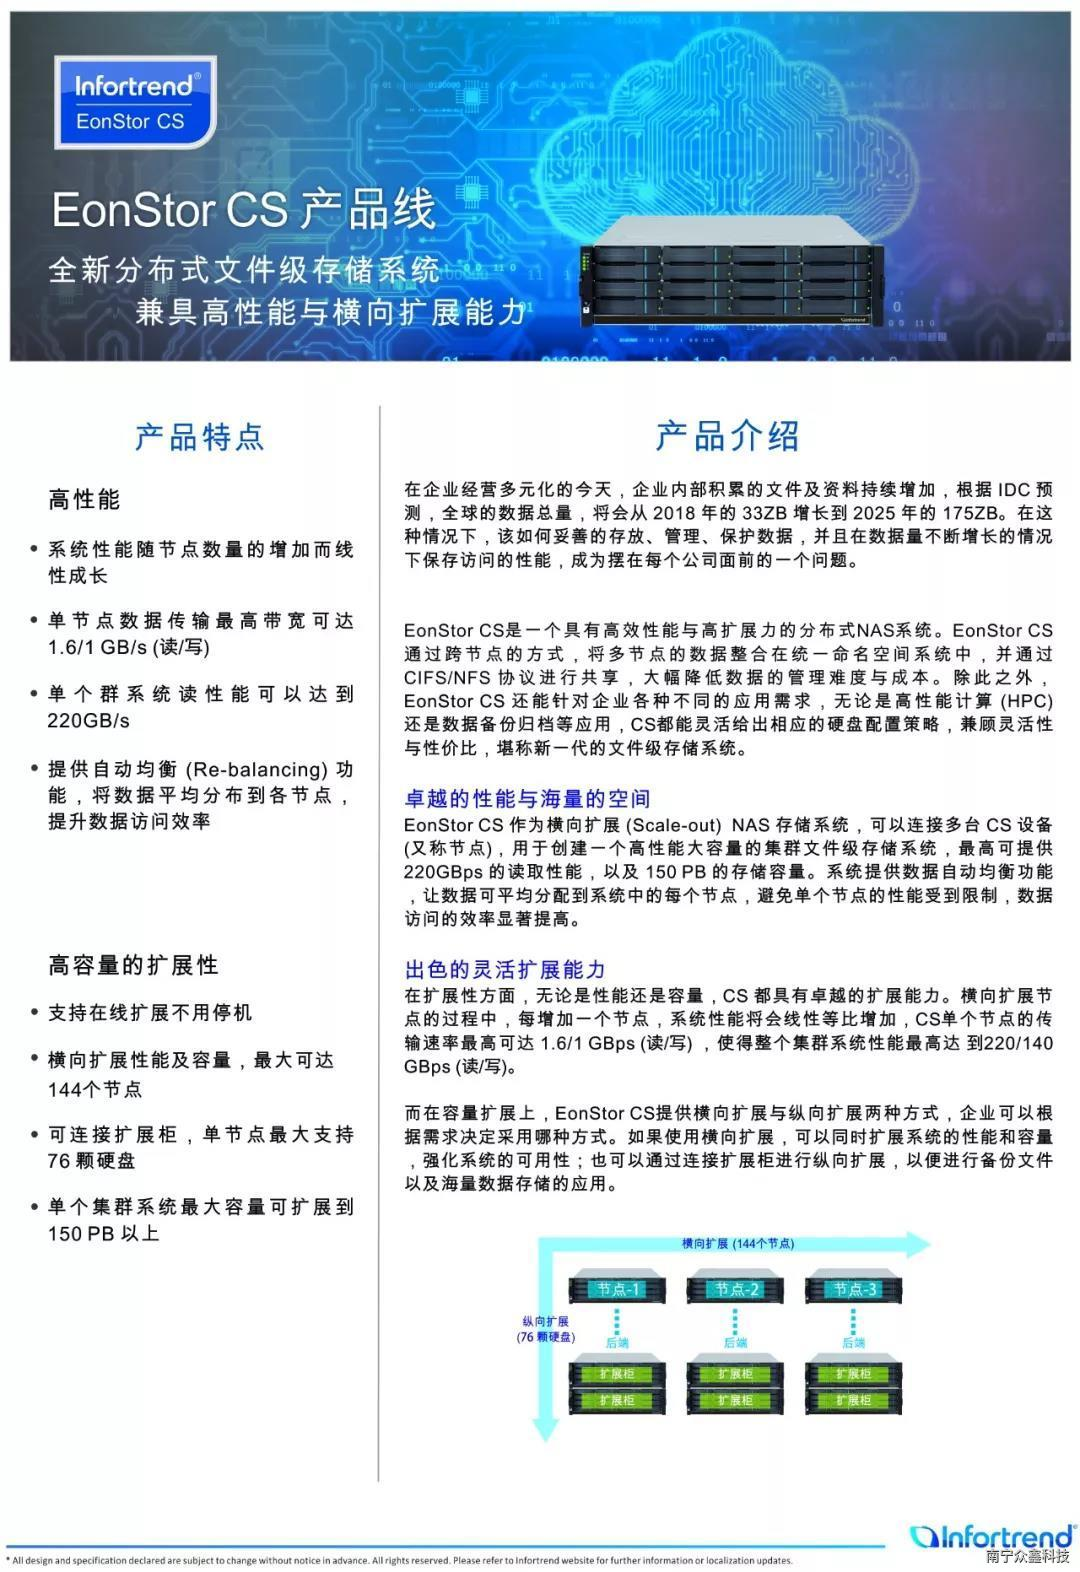 infortrend普安存儲-EonStor CS 分布式NAS 存儲